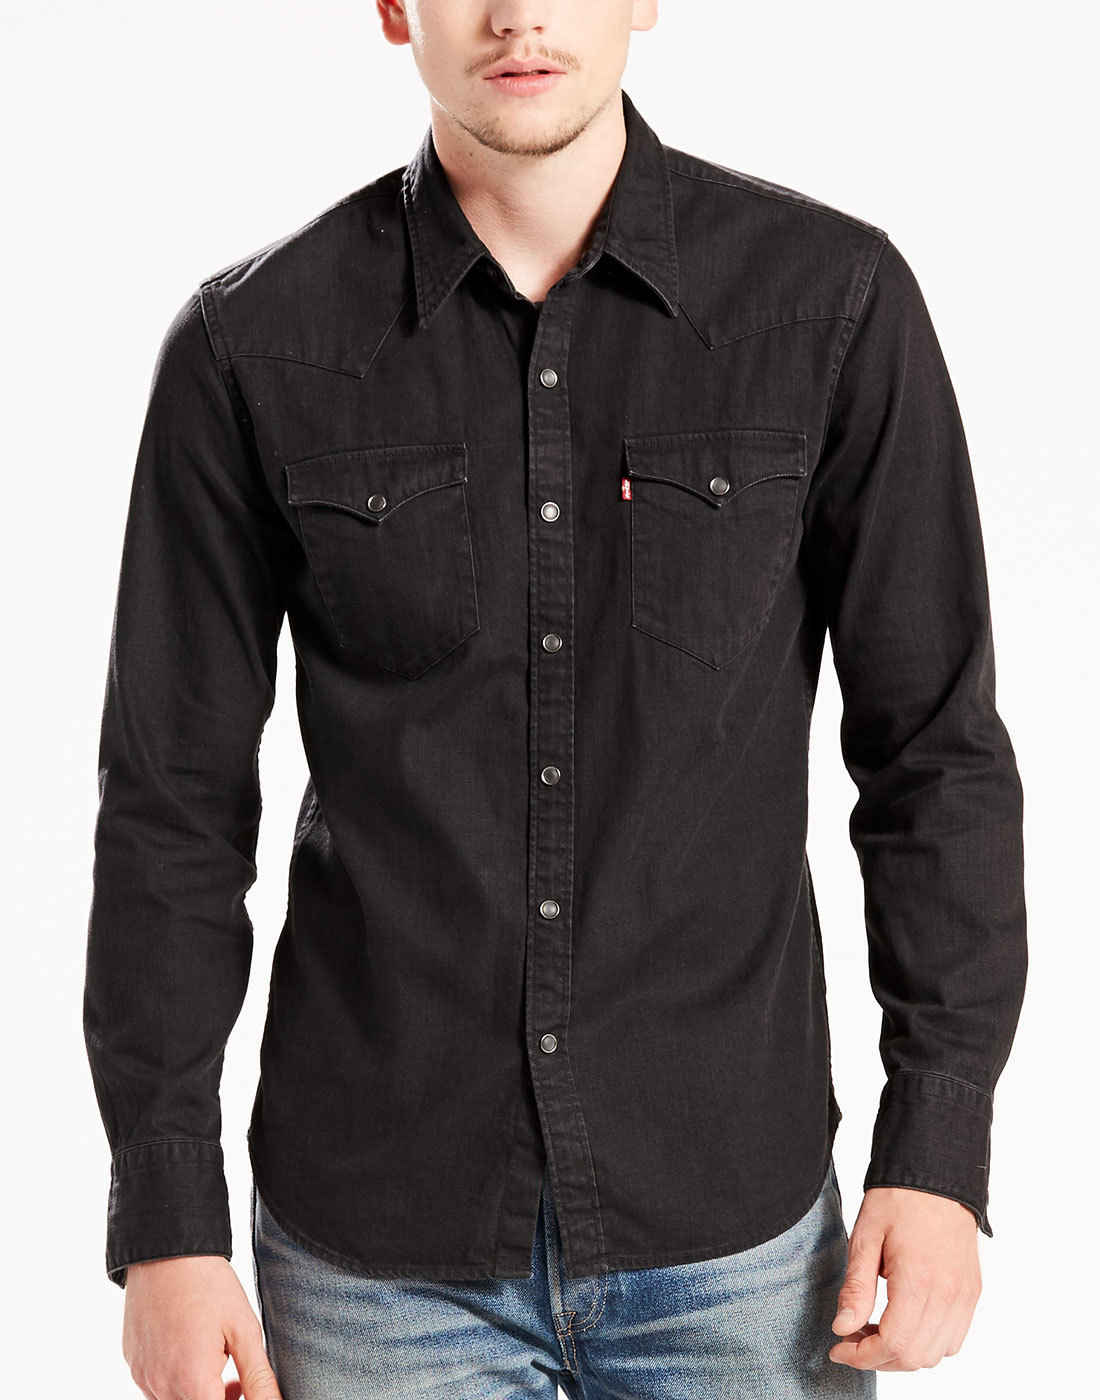 ae90de894fb LEVI S® Barstow Men s Retro 70s Mod Denim Western Shirt in Black